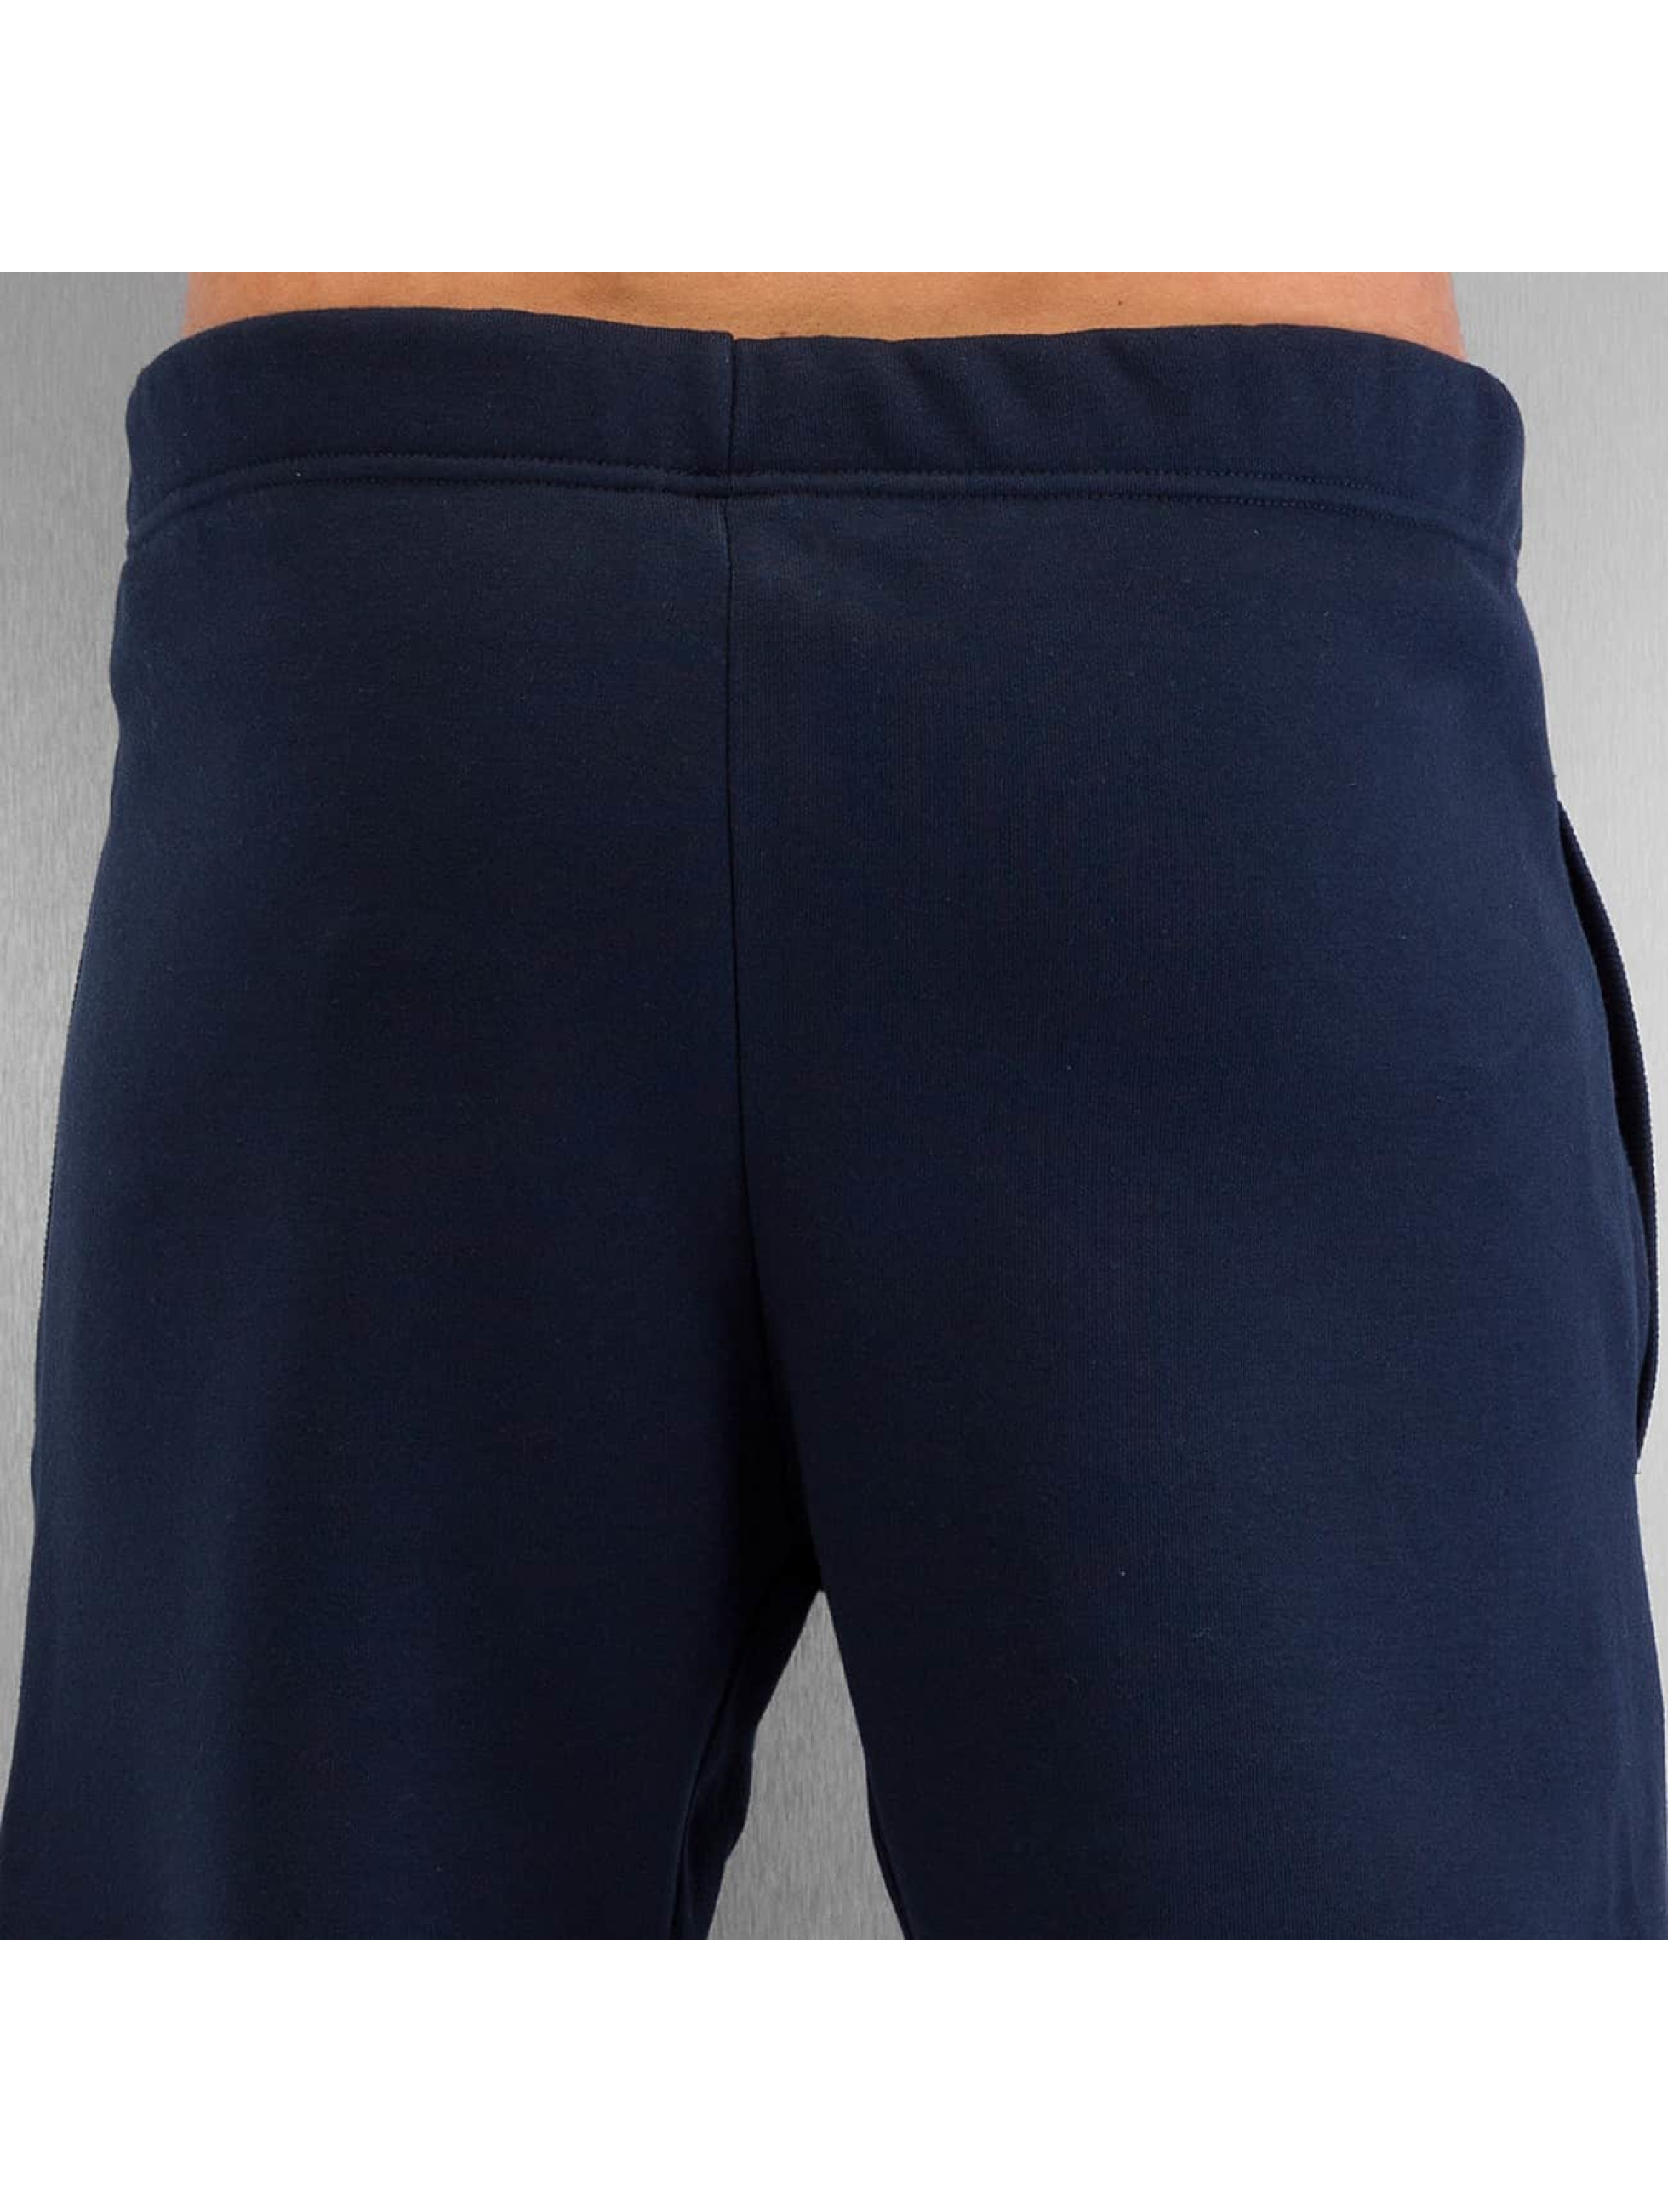 Carhartt WIP Спортивные брюки WIP Heavy синий